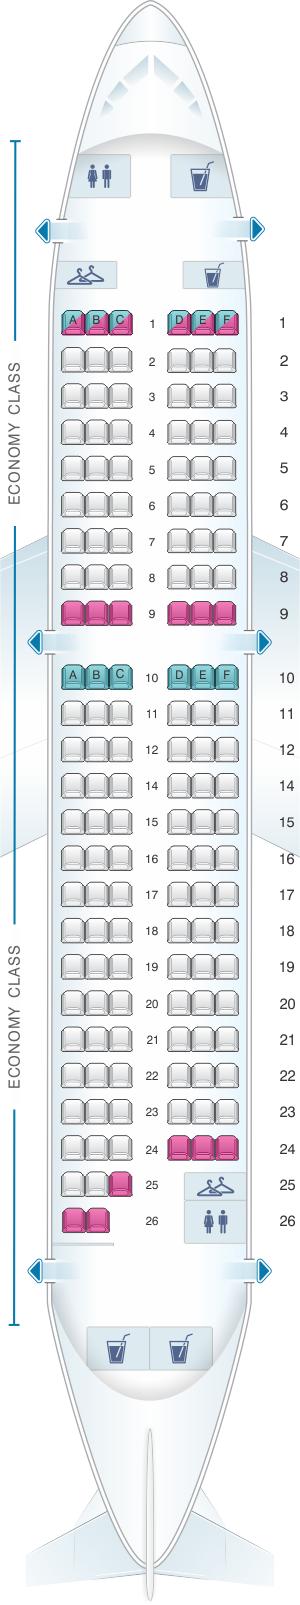 Seat map for Air France Airbus A319 Metropolitan V2